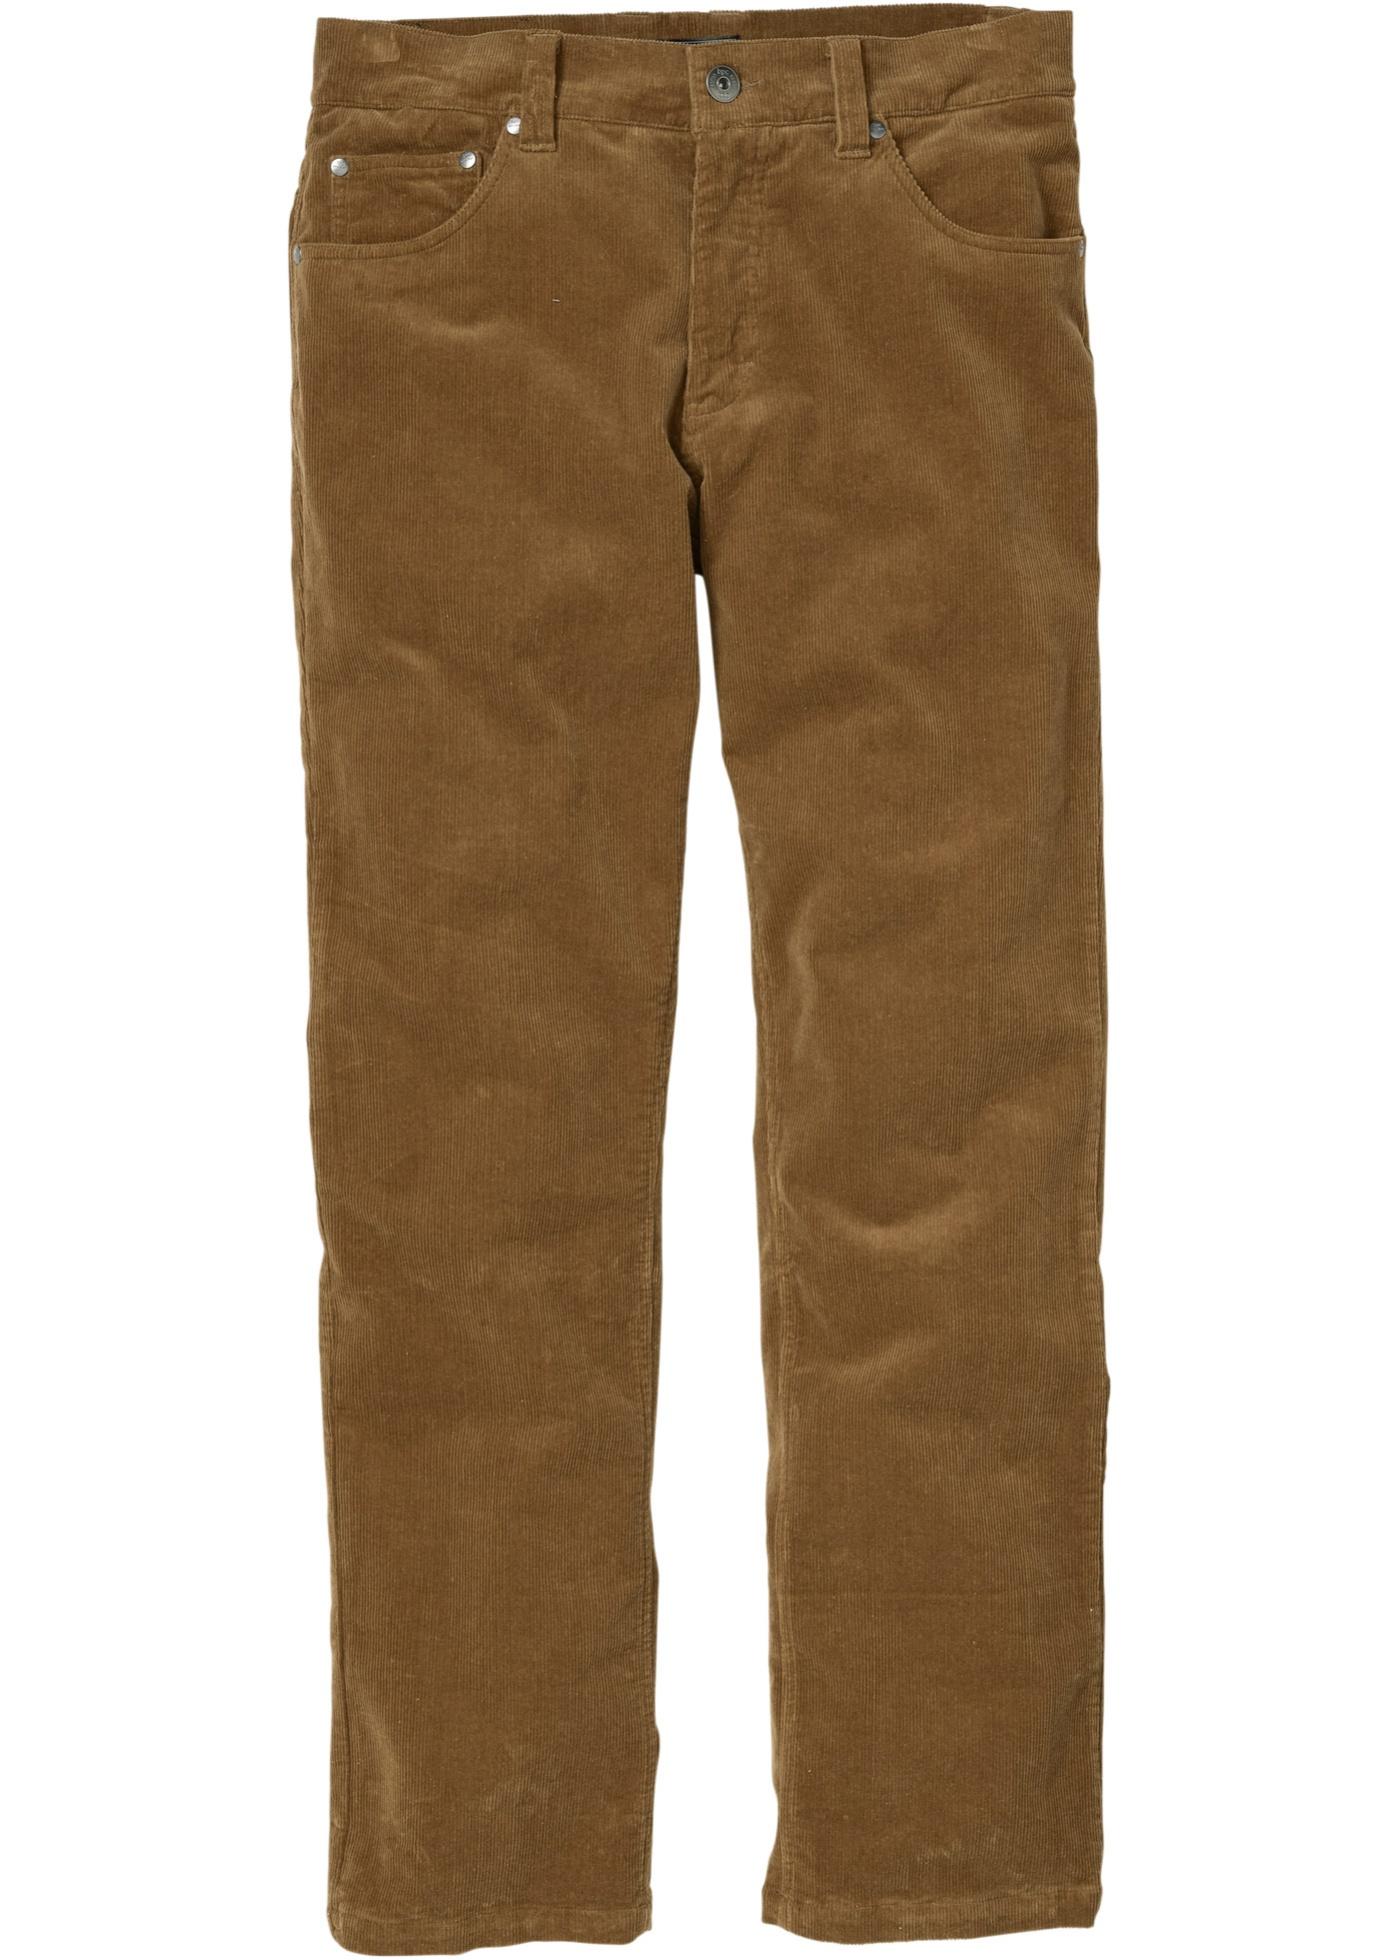 Pantalone in velluto elas